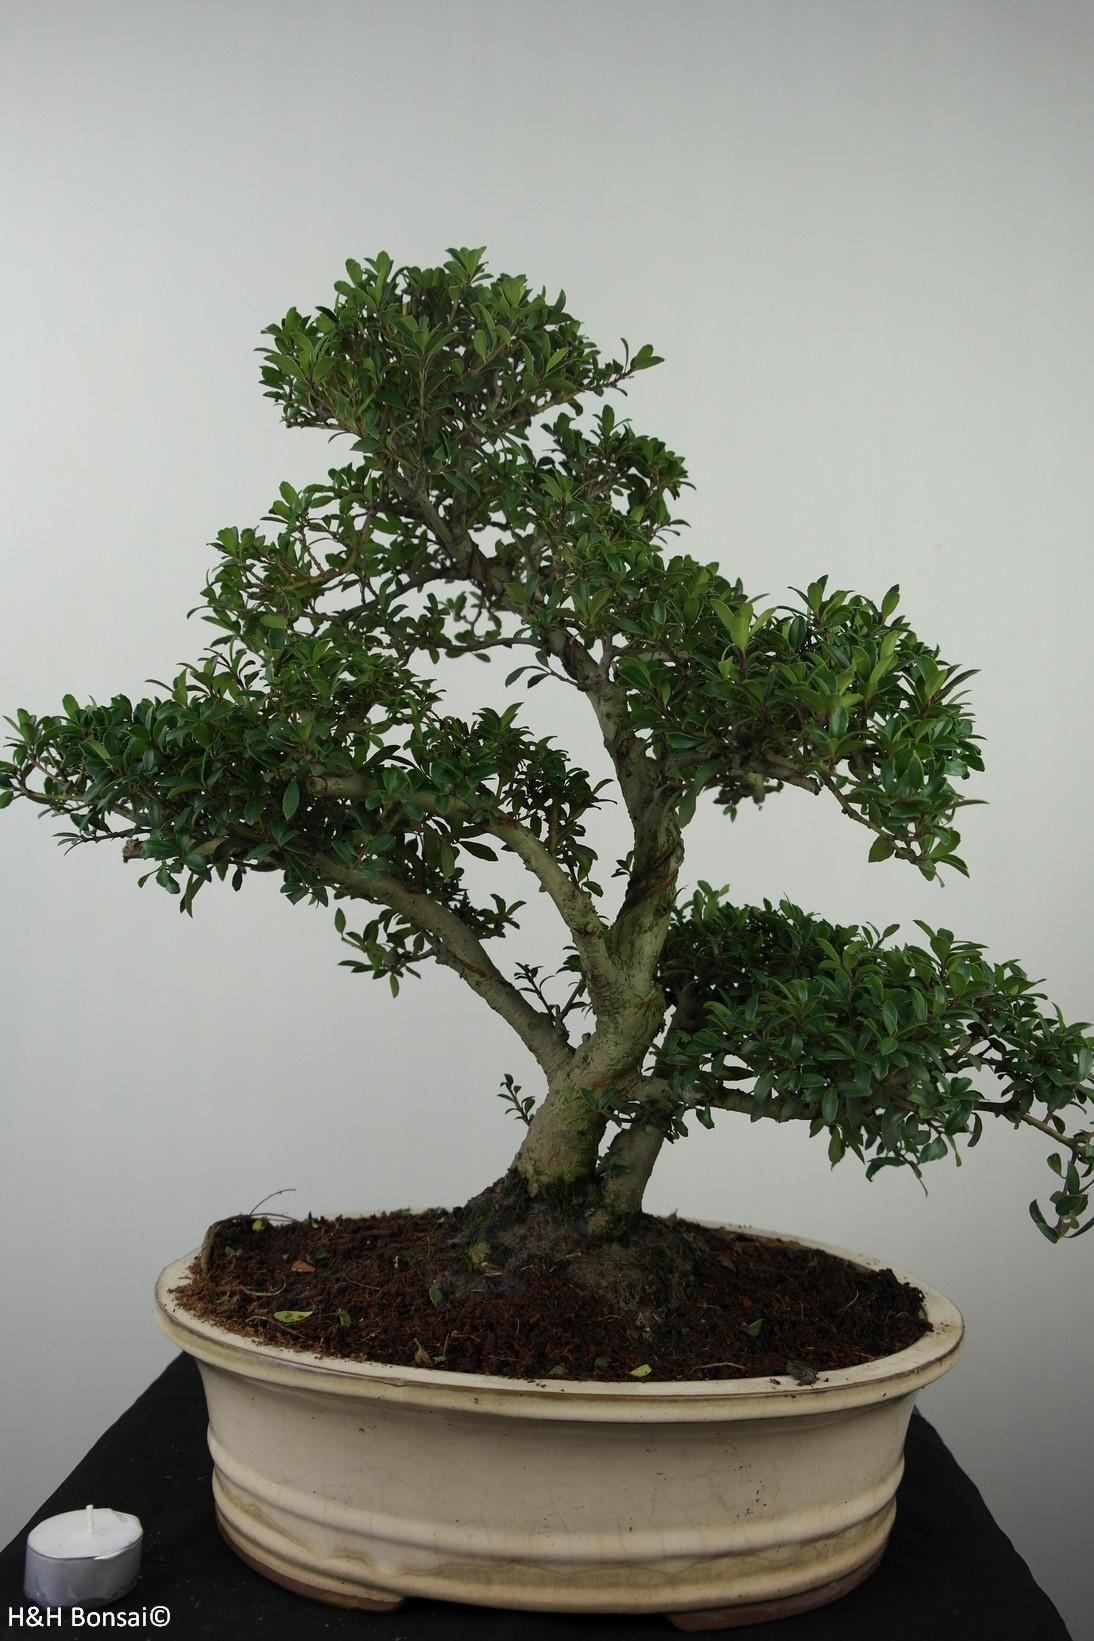 Bonsai Japanese Holly, Ilex crenata, no. 7744